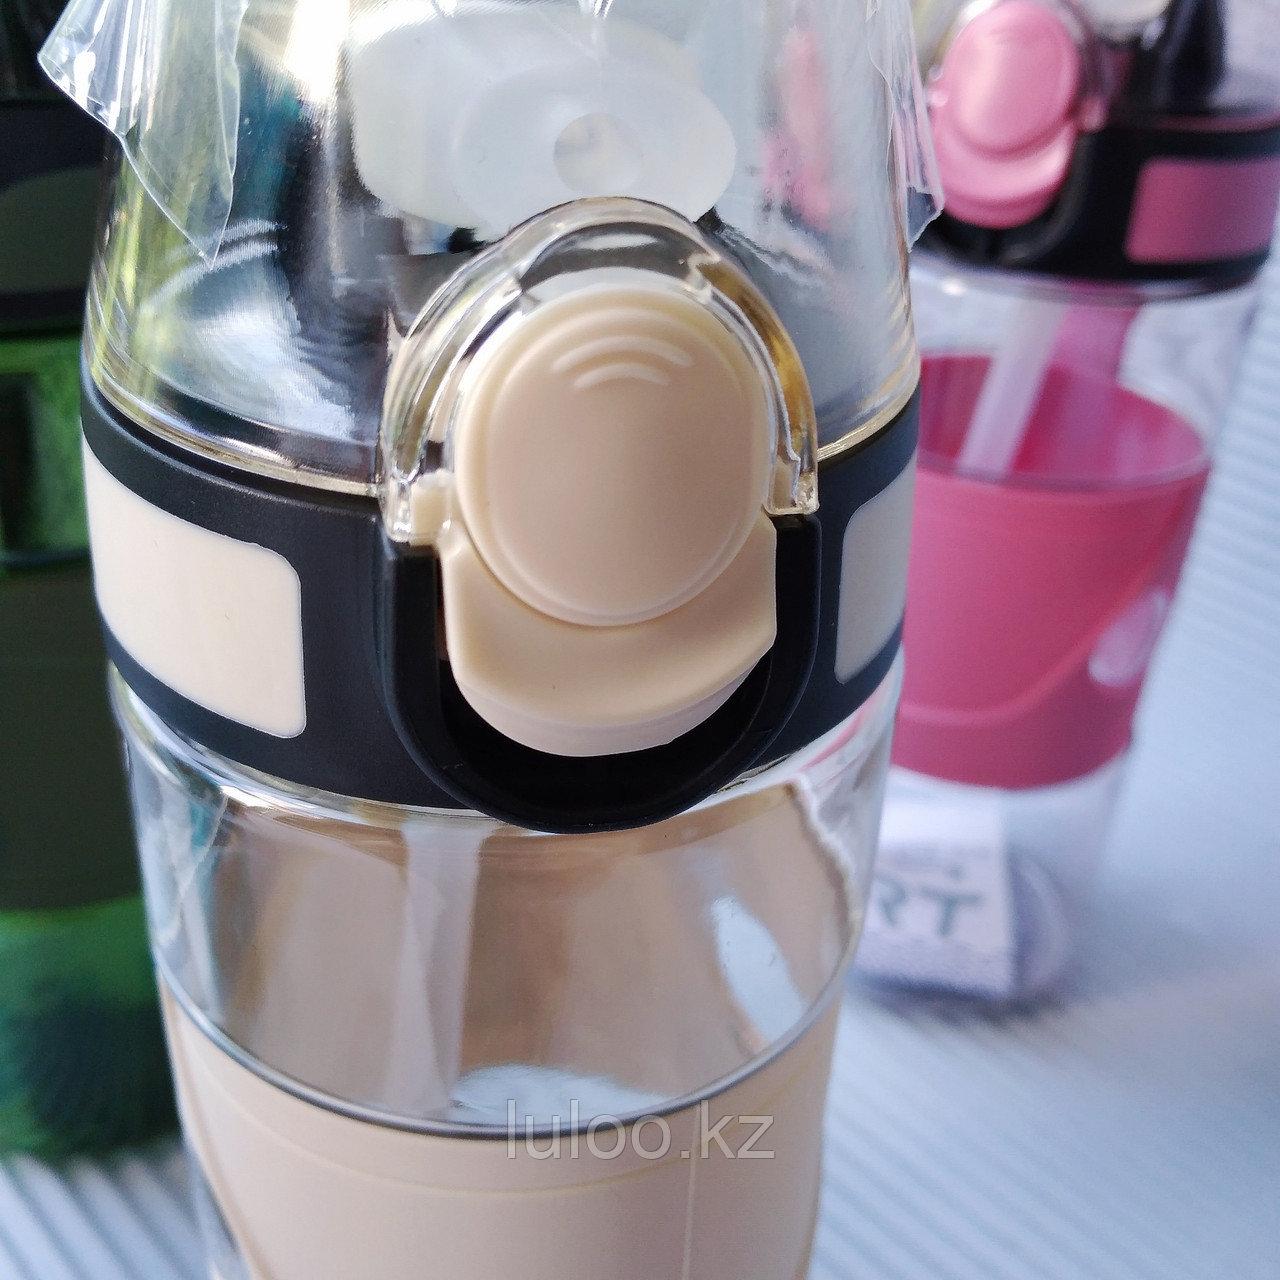 "Спортивная бутылка для воды ""Sport"", 500мл. - фото 7"